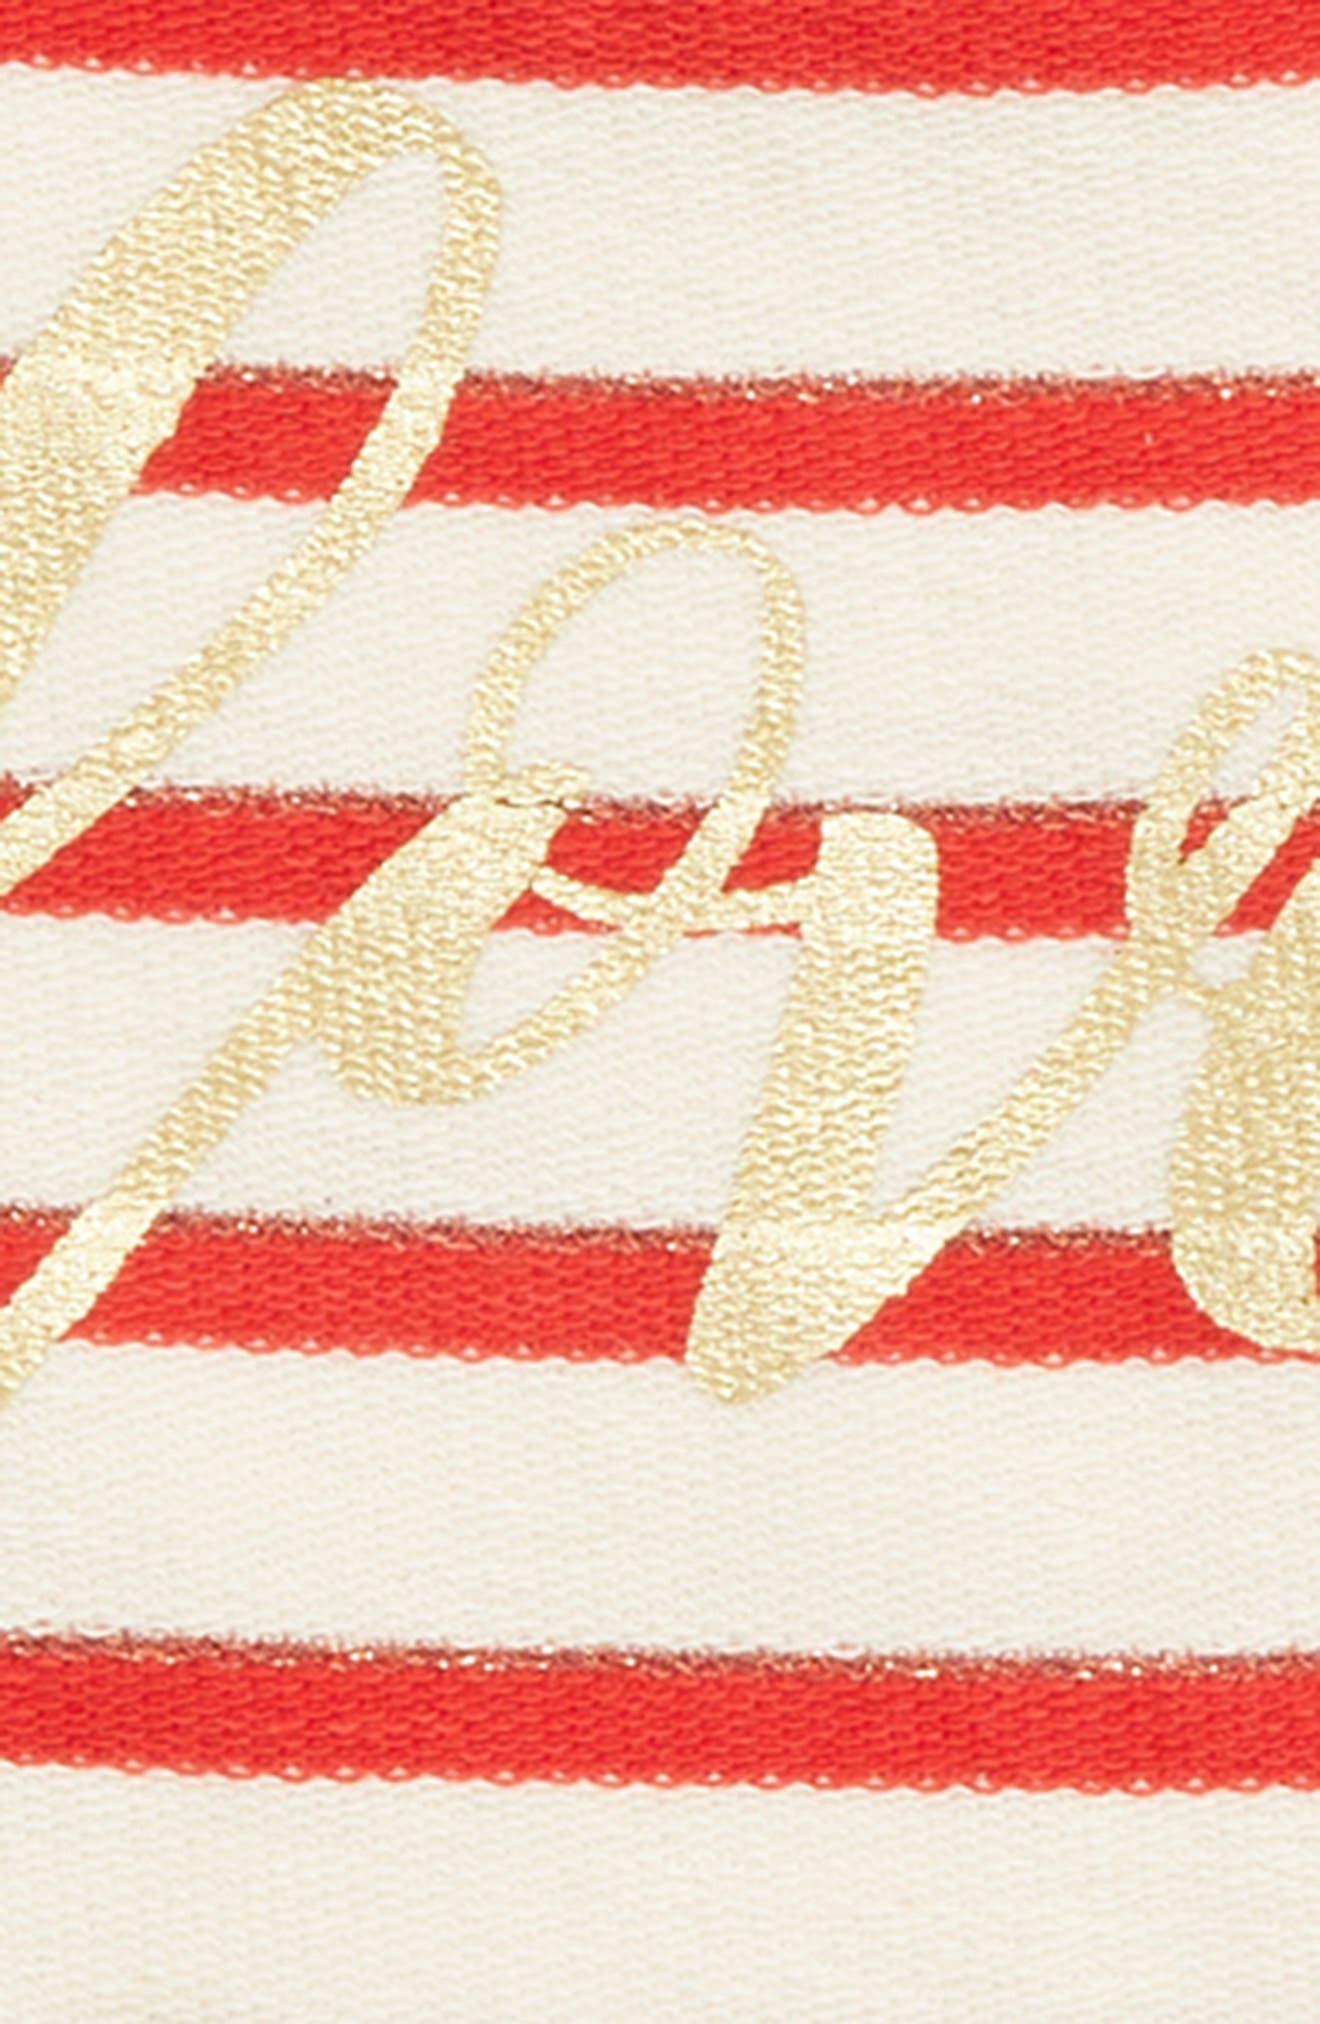 PEEK AREN'T YOU CURIOUS,                             Love Sweatshirt,                             Alternate thumbnail 2, color,                             RED